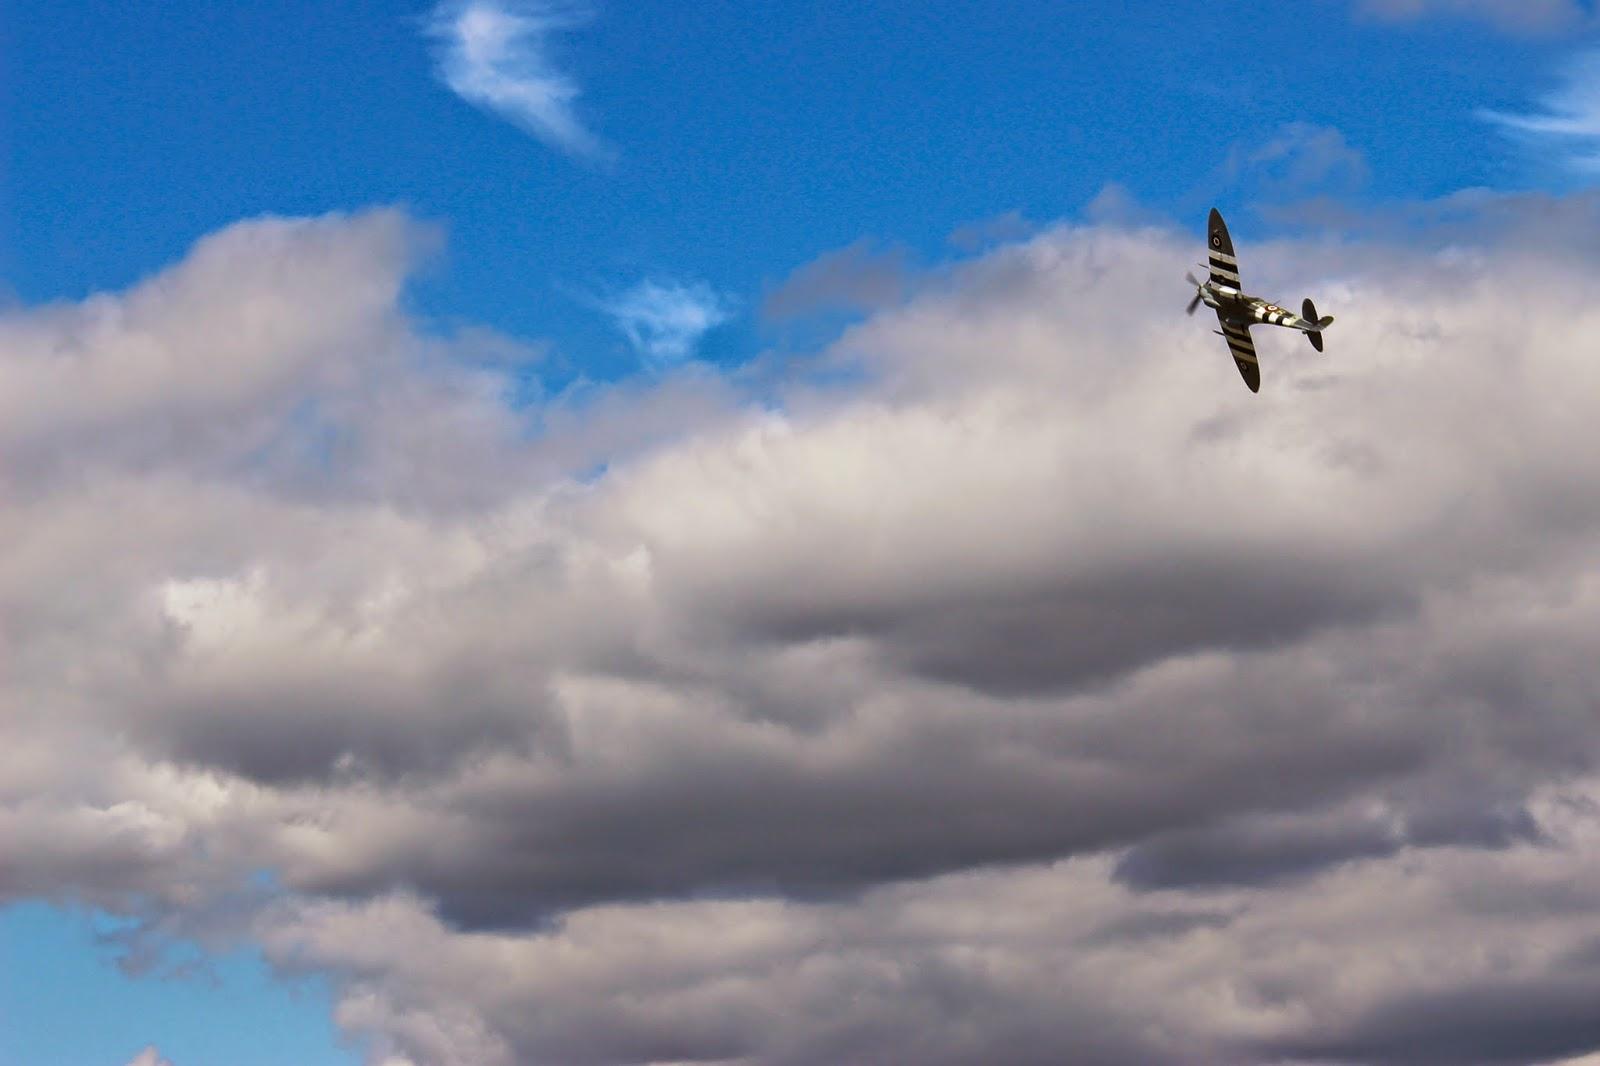 Red Bull Air Race 2014